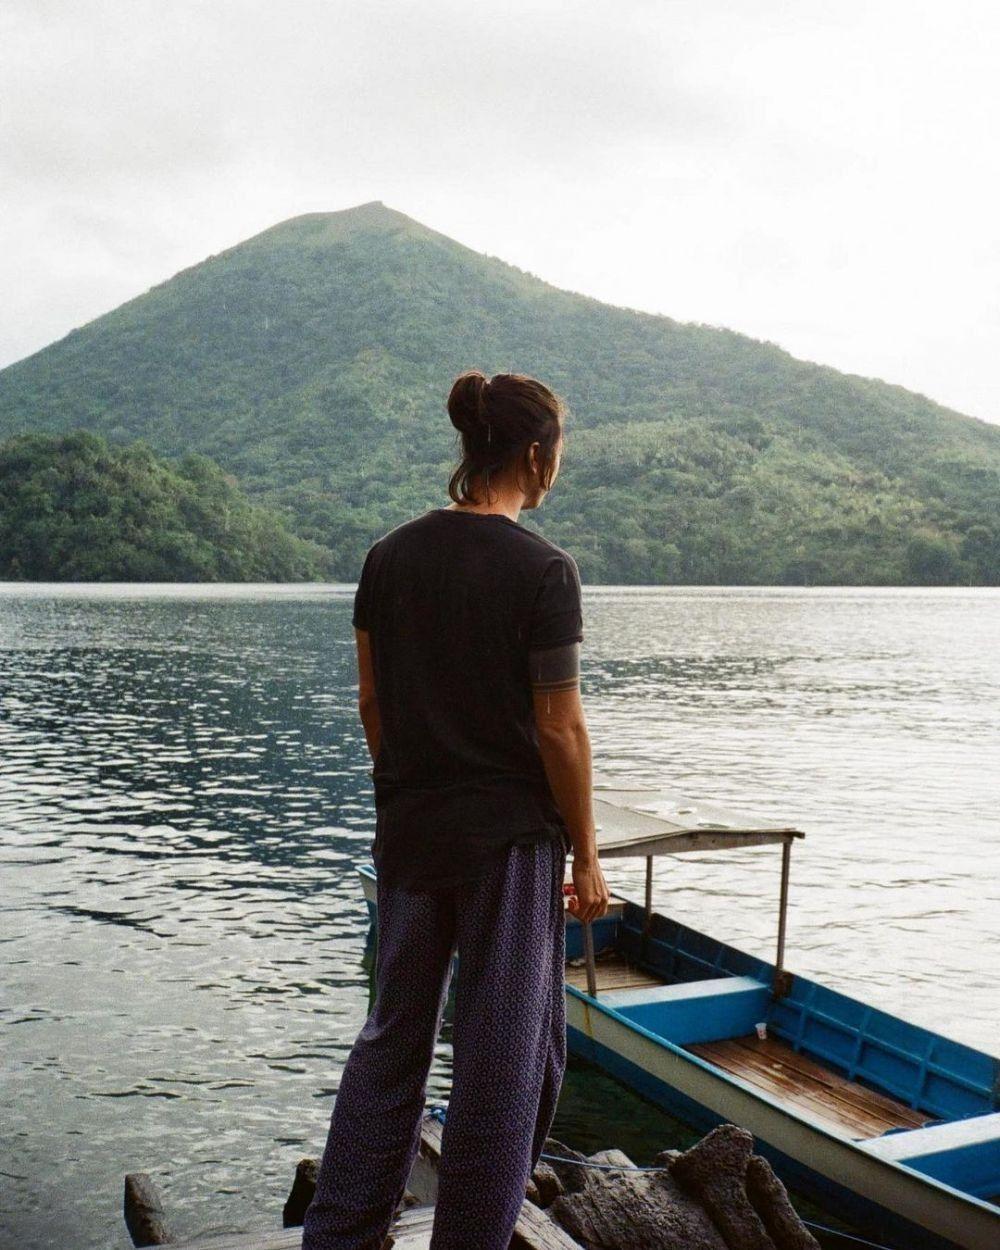 10 Wisata Seru Favorit Dikta Wicaksono, Langsung Masuk Bucket List!